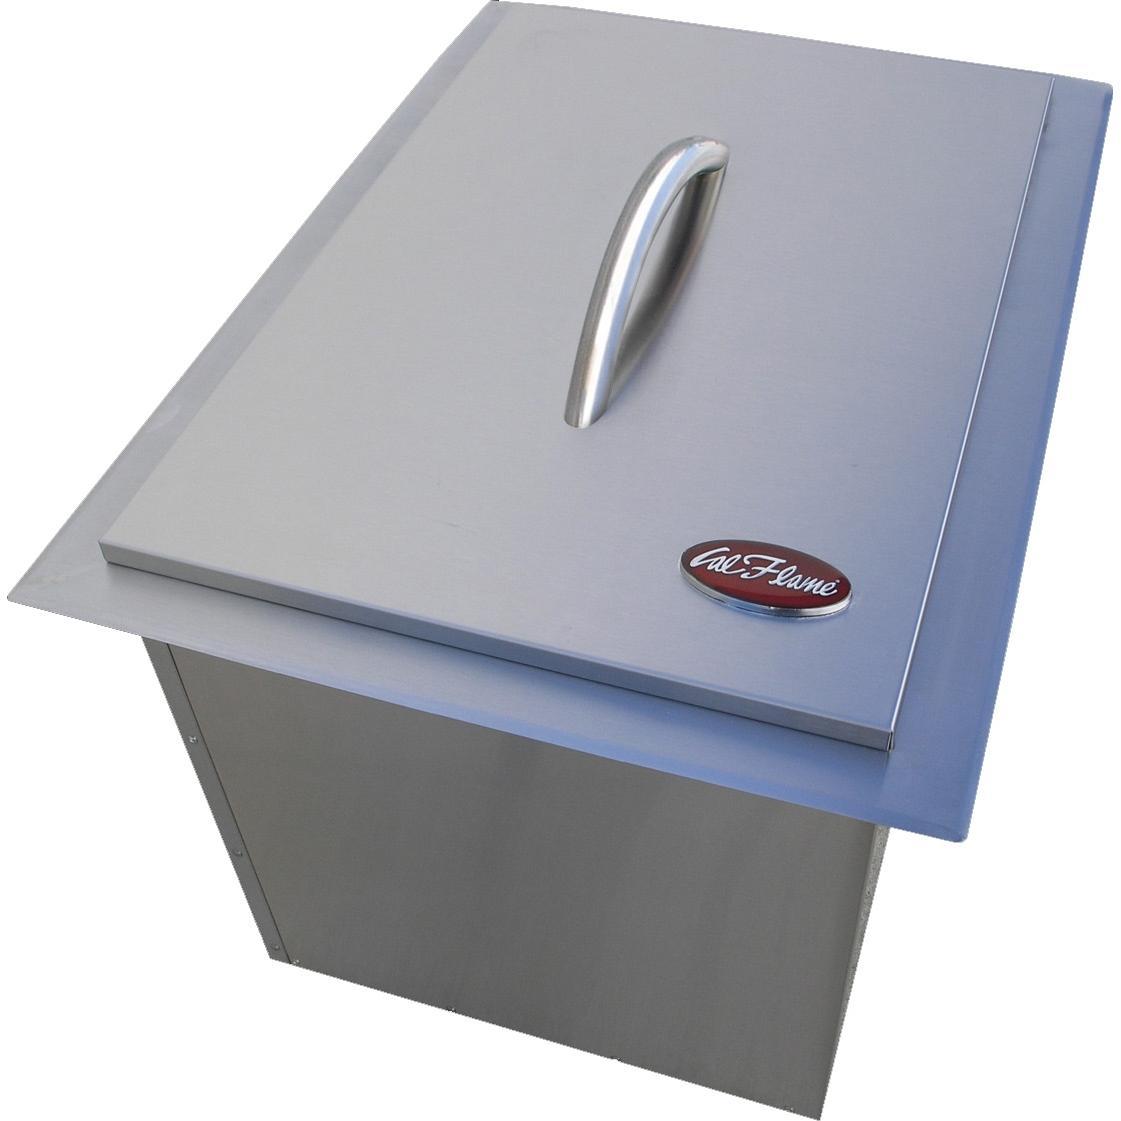 outdoor kitchen ice bin photo - 4